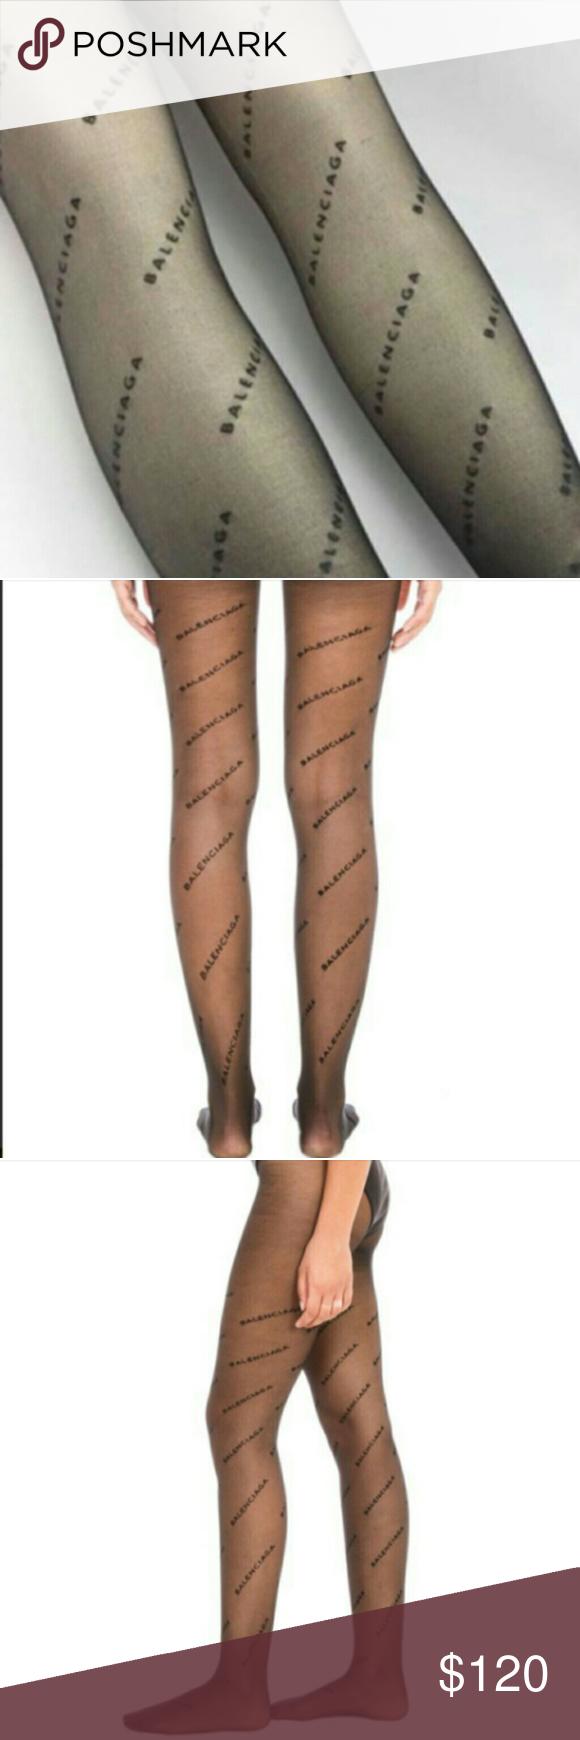 8f1d5404c3797 Black Balenciaga leggings New Balenciaga stockings leggings Same day  shipping Best offer accepted Balenciaga Accessories Hosiery & Socks